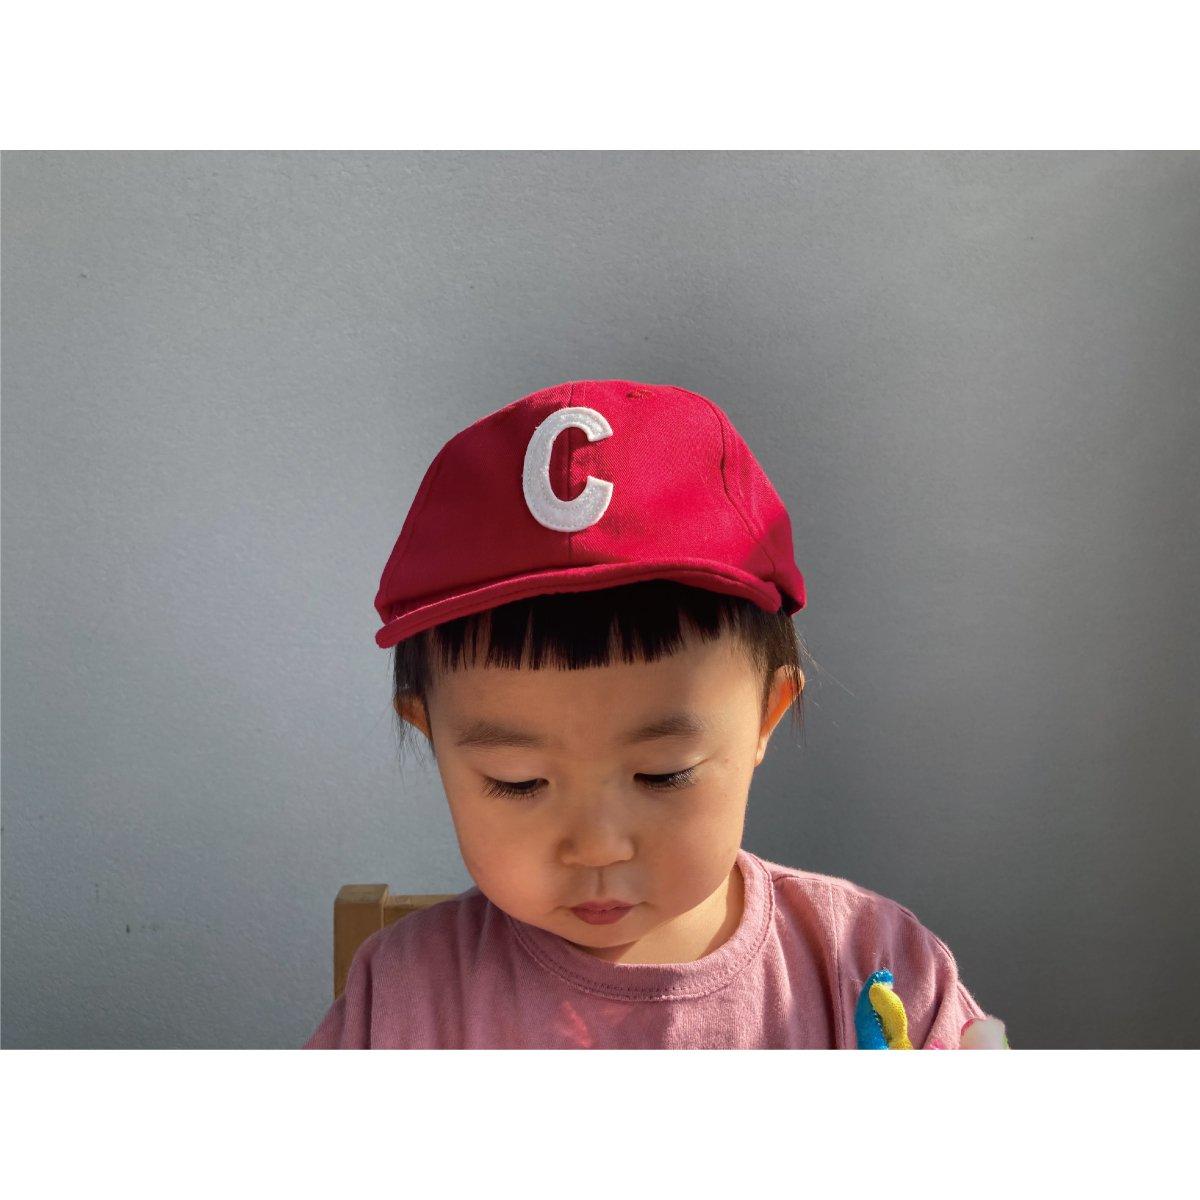 【KIDS】Kids Sim Logo Cap 詳細画像41